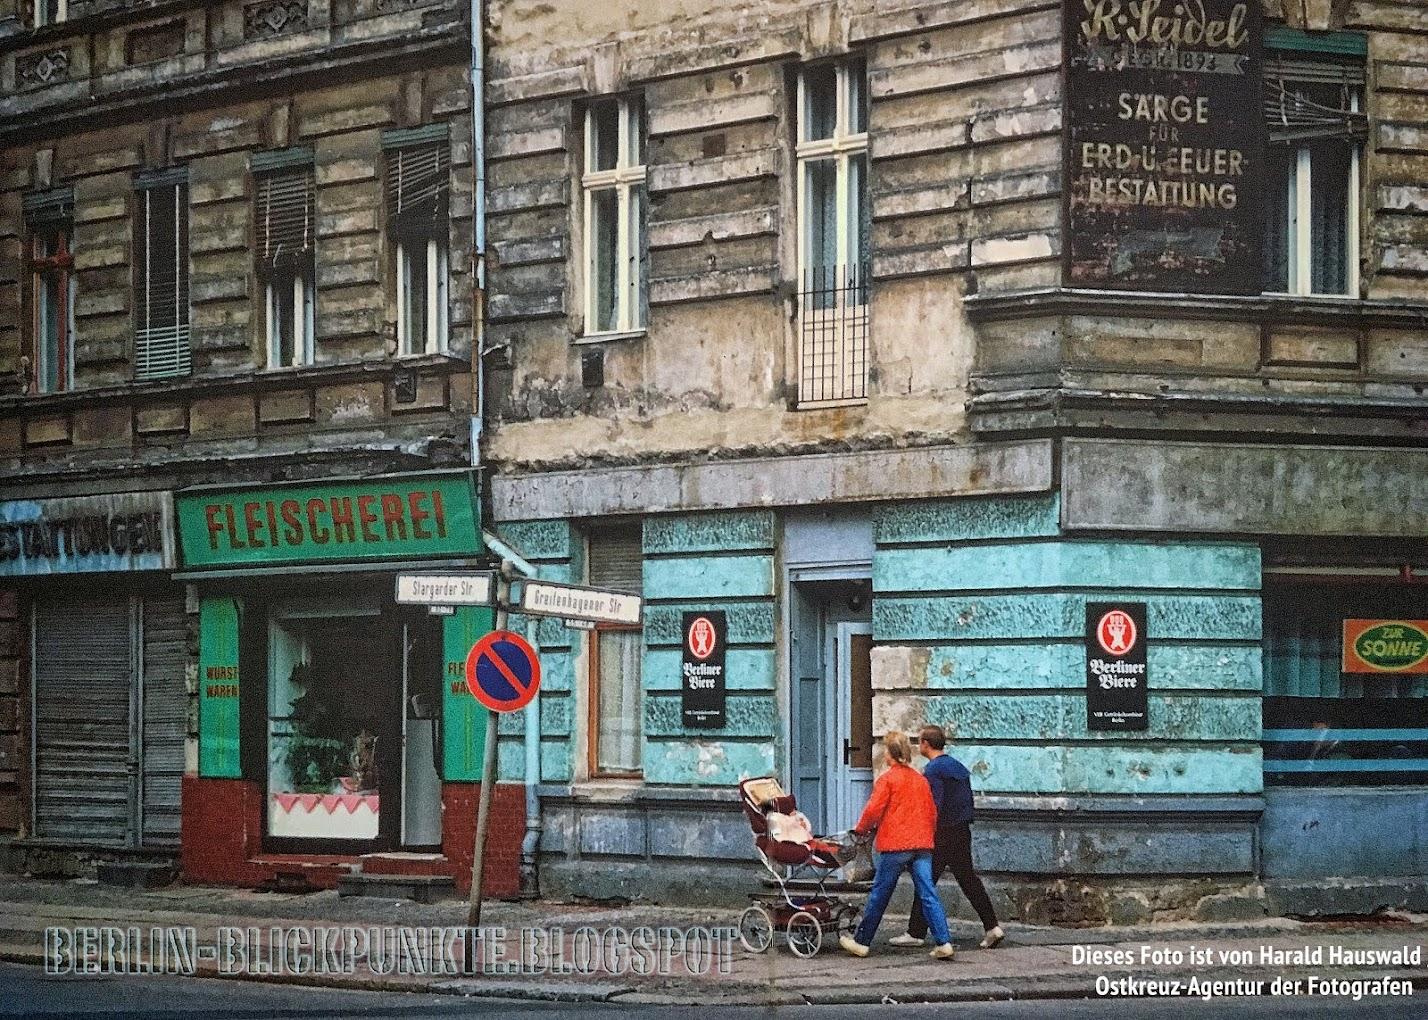 http://berlin-blickpunkte.blogspot.com/